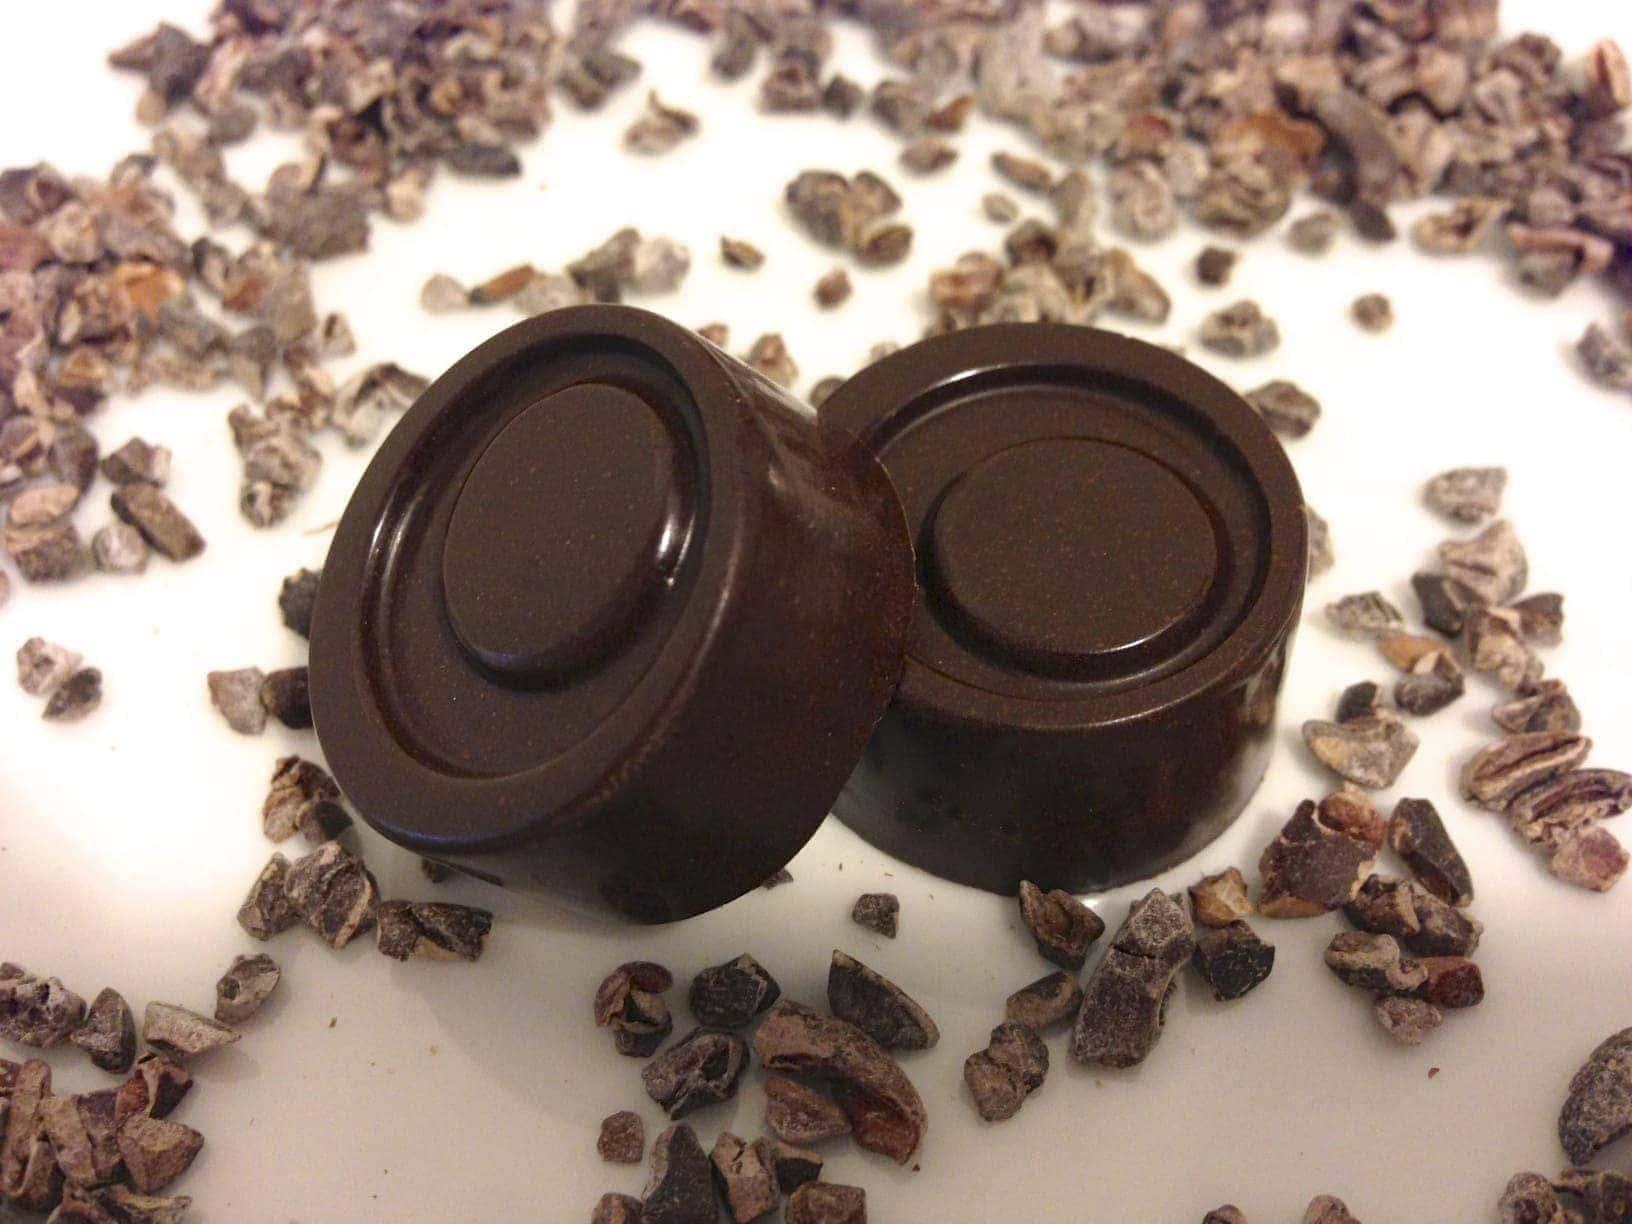 How to make 84% dark chocolate from scratch using honey ...